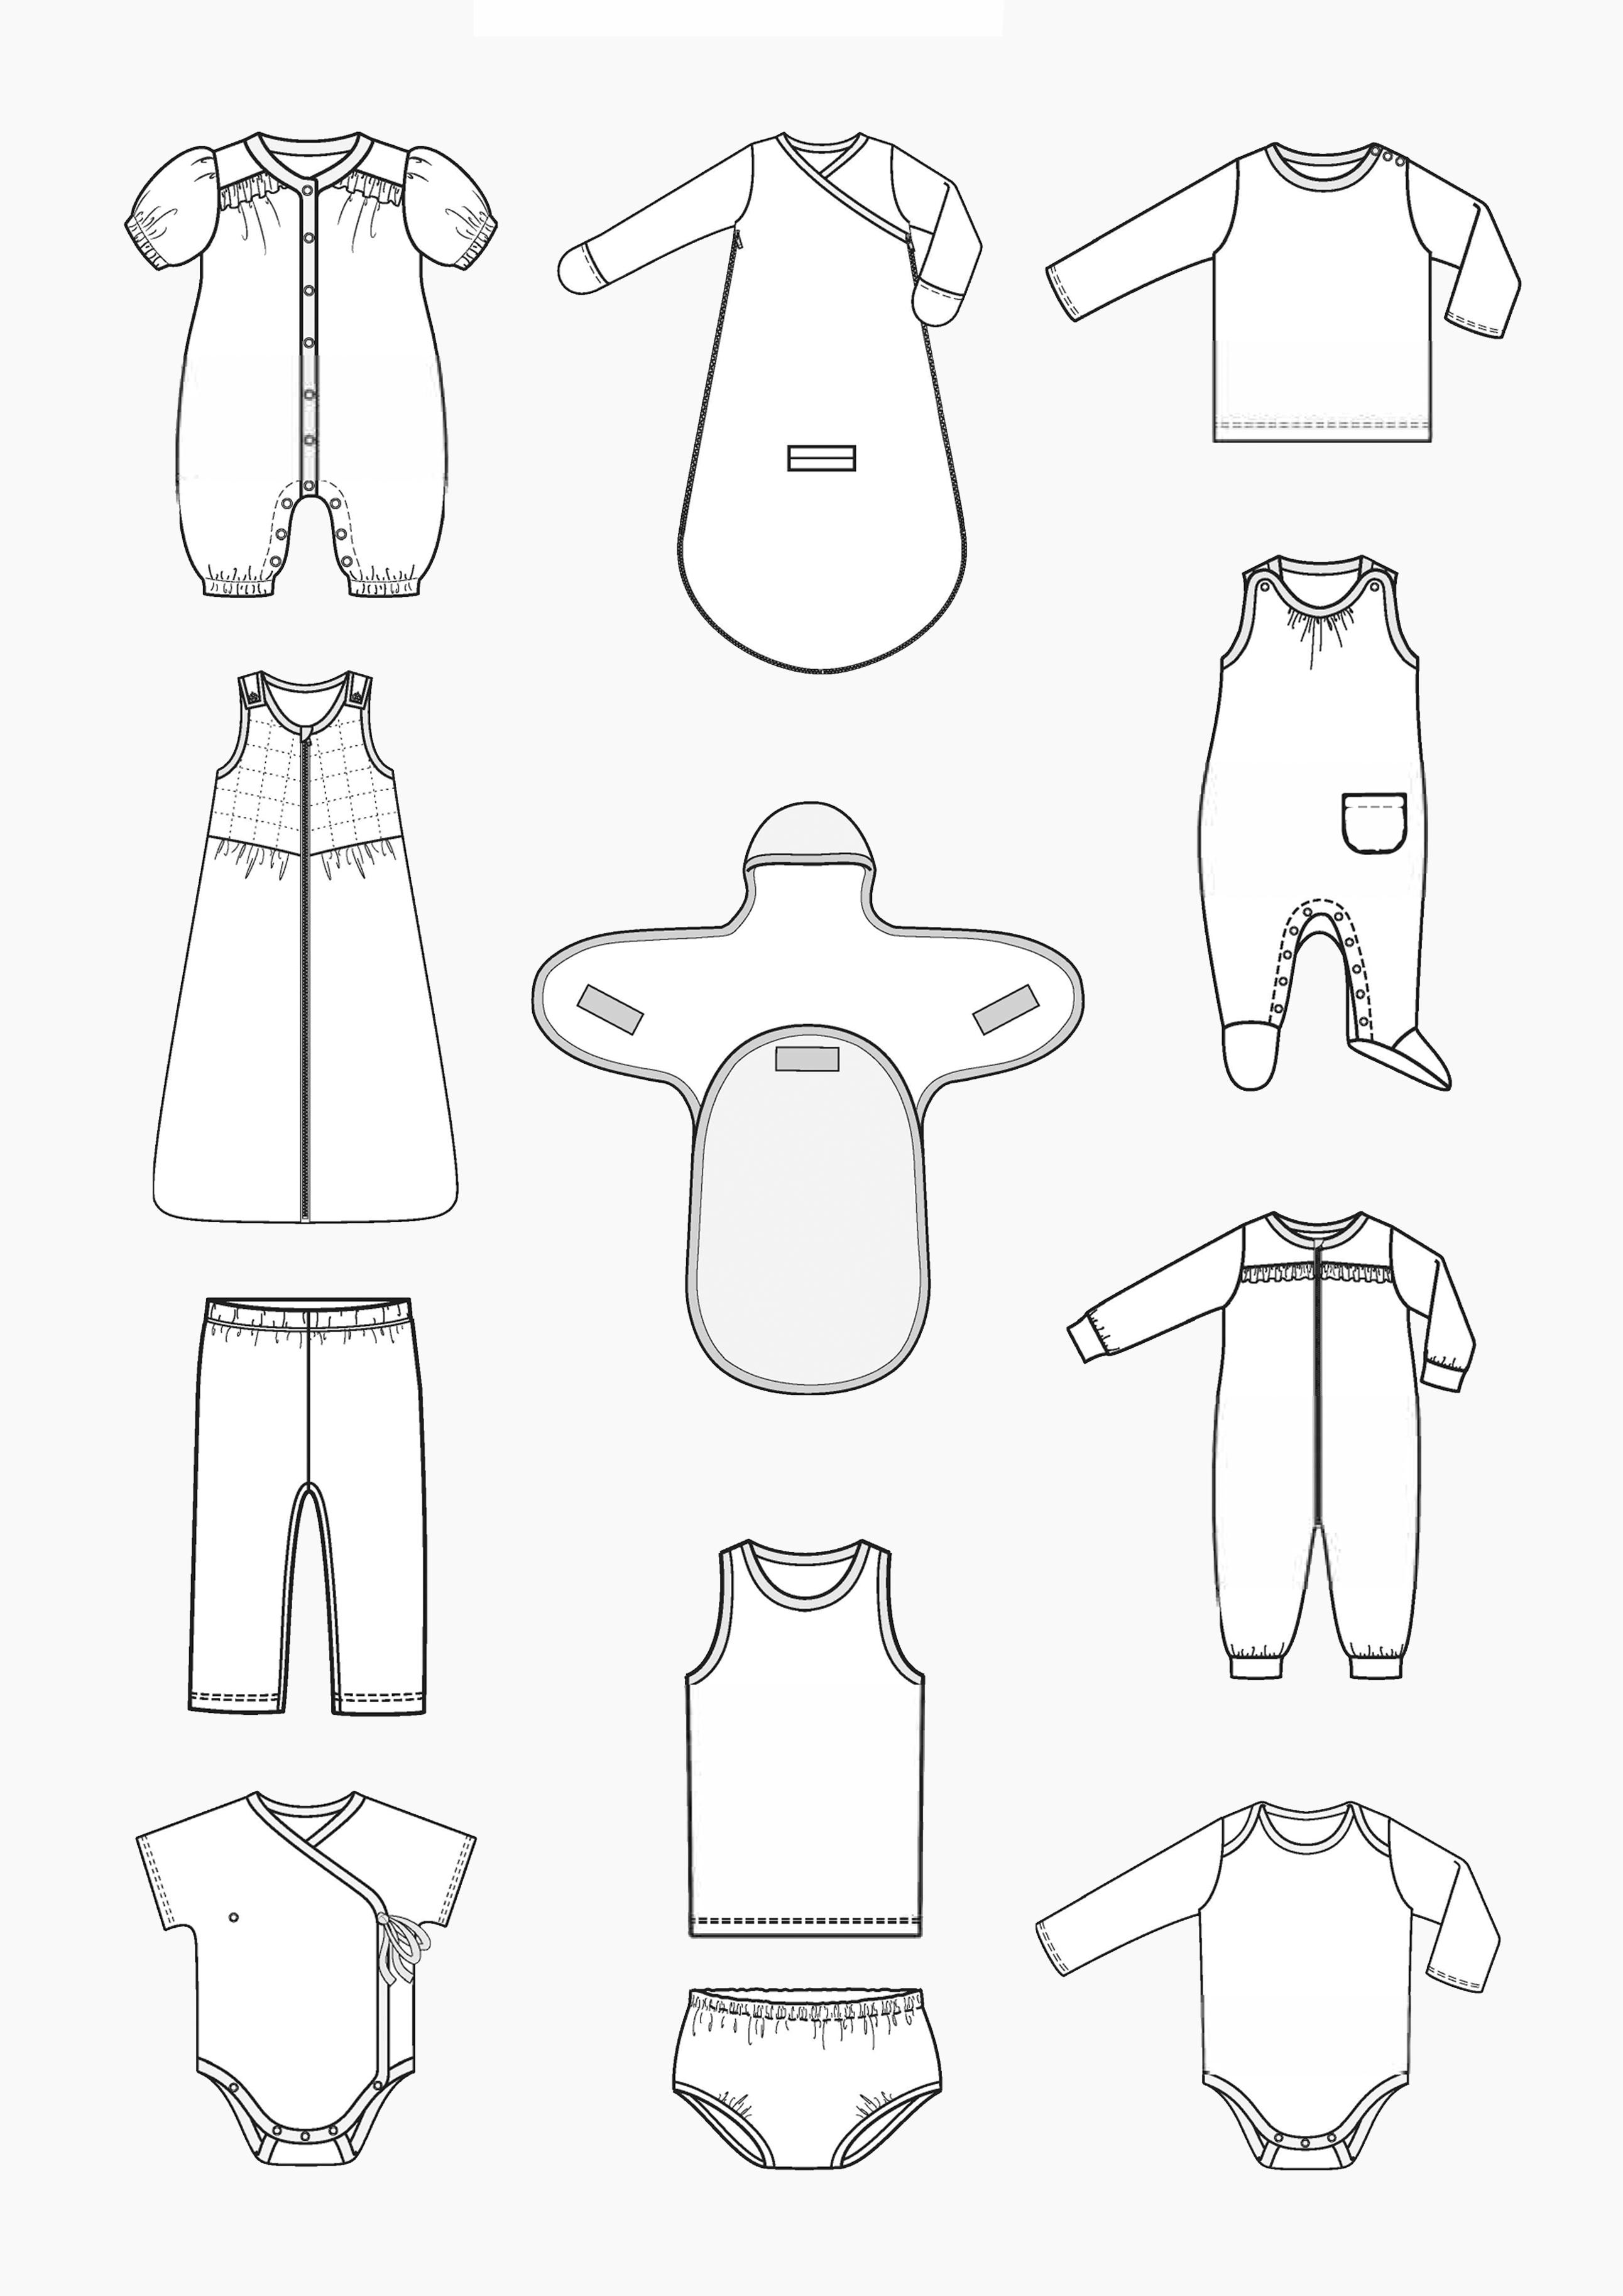 Produkt: Schnitt-Technik Babykleidung